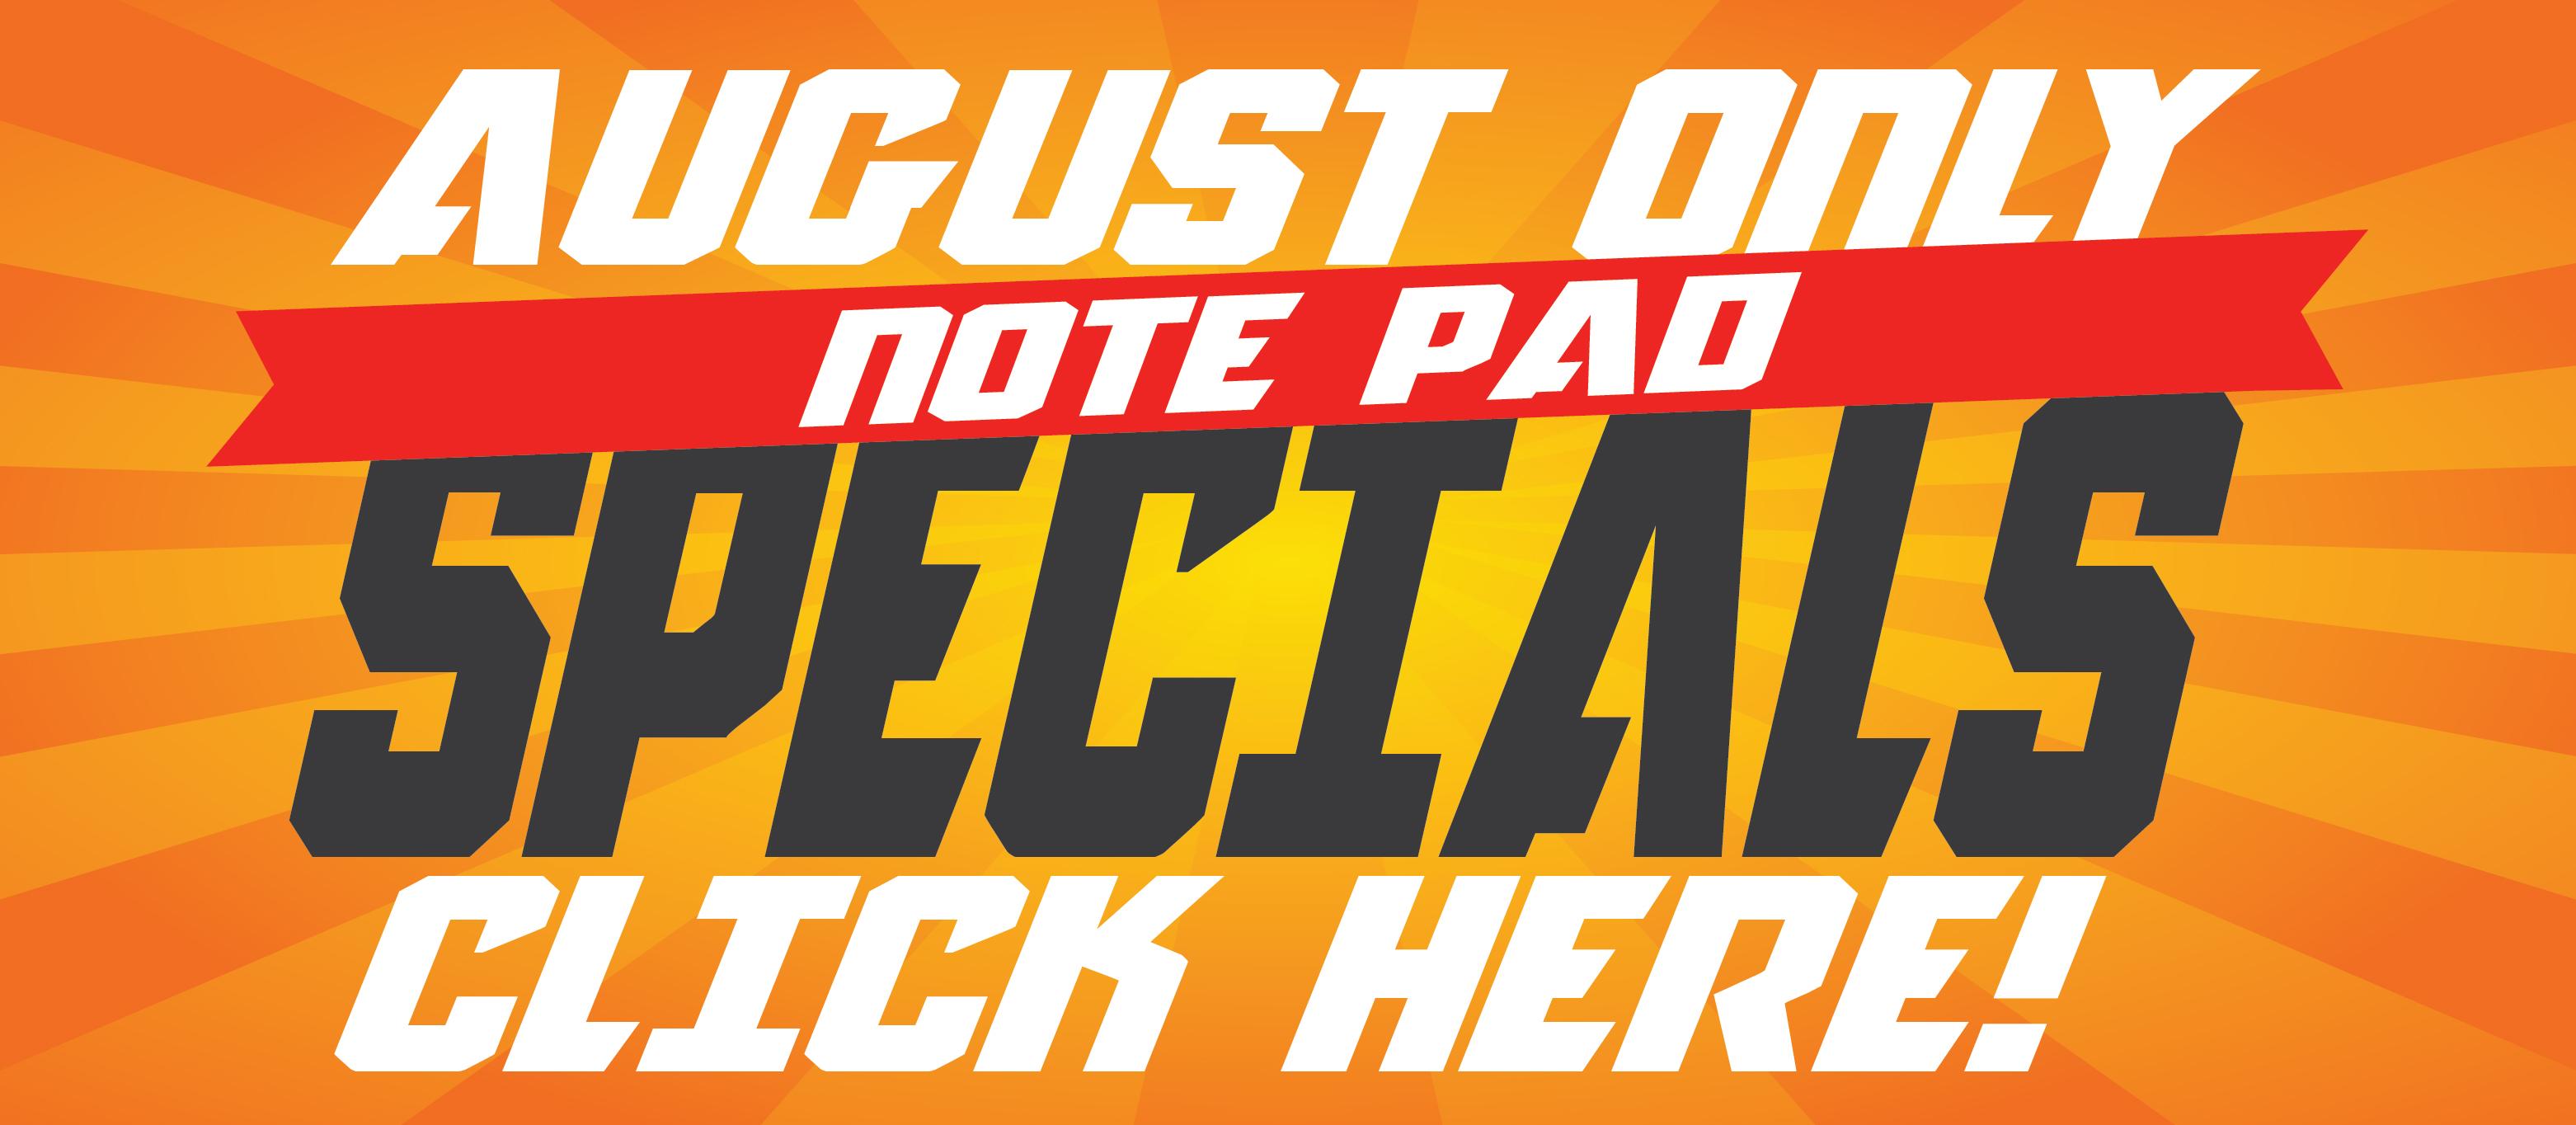 Specials-Web-Header-01